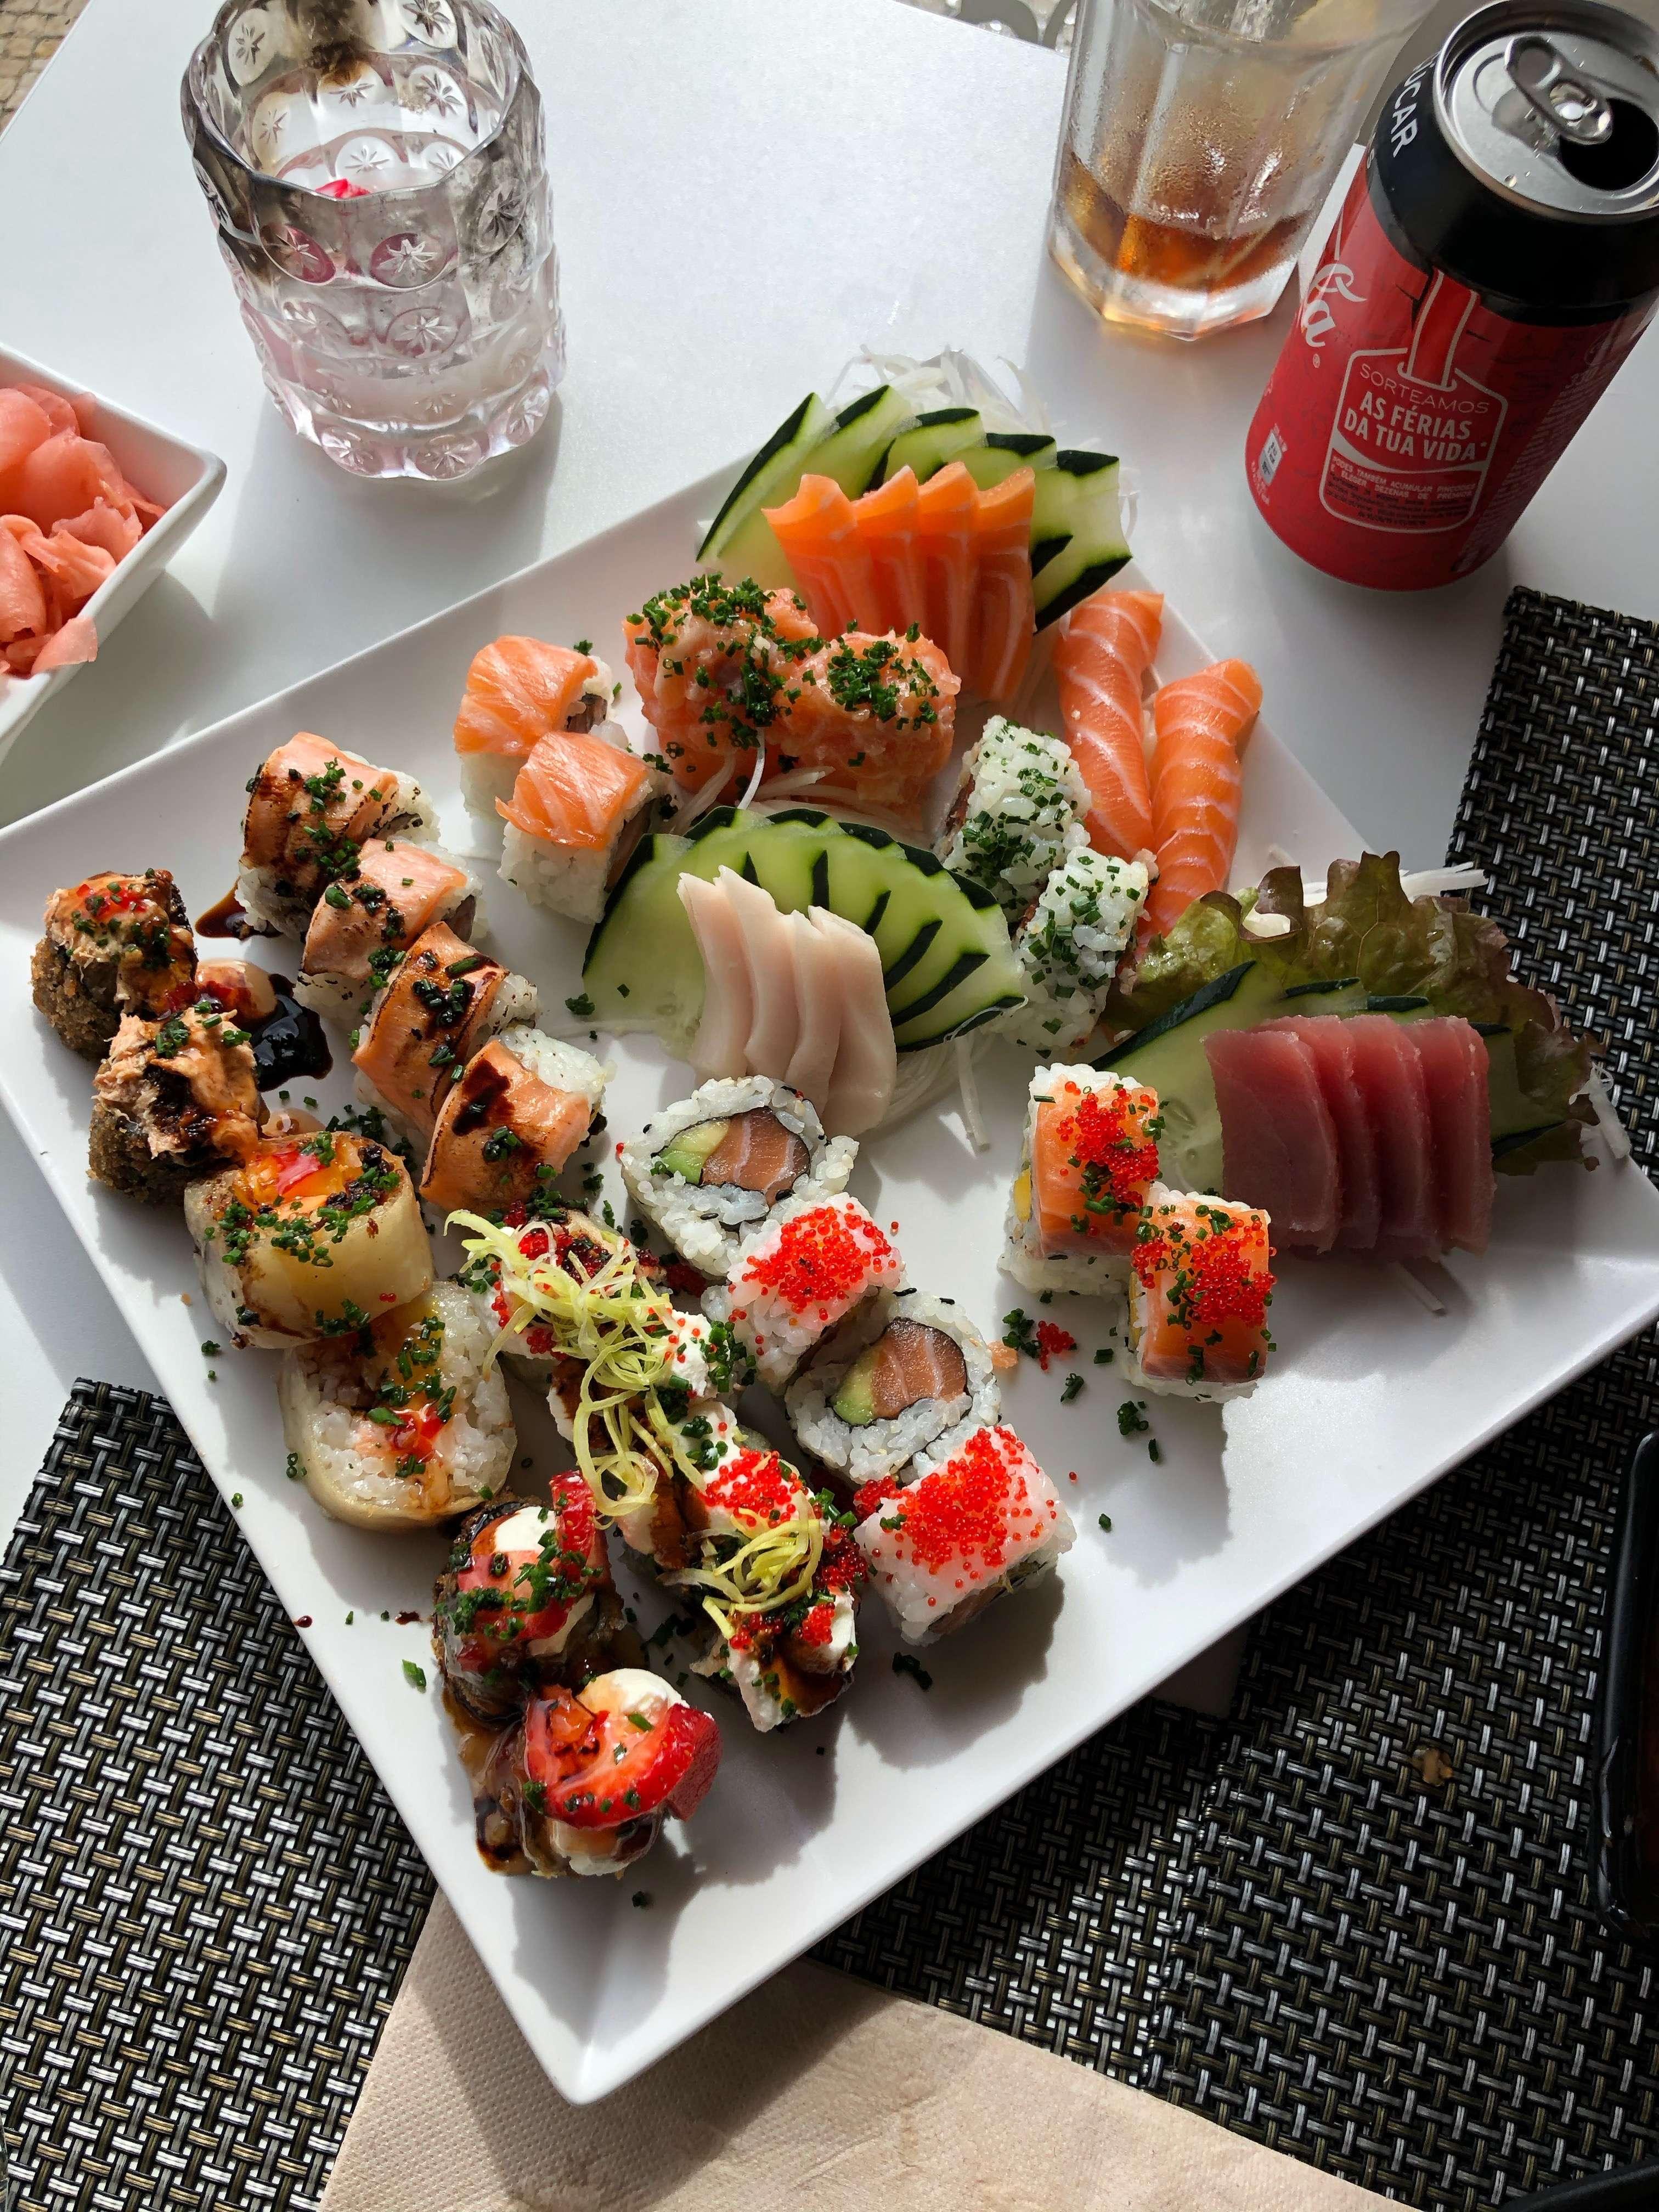 Amaterasu Pateo do Sushi